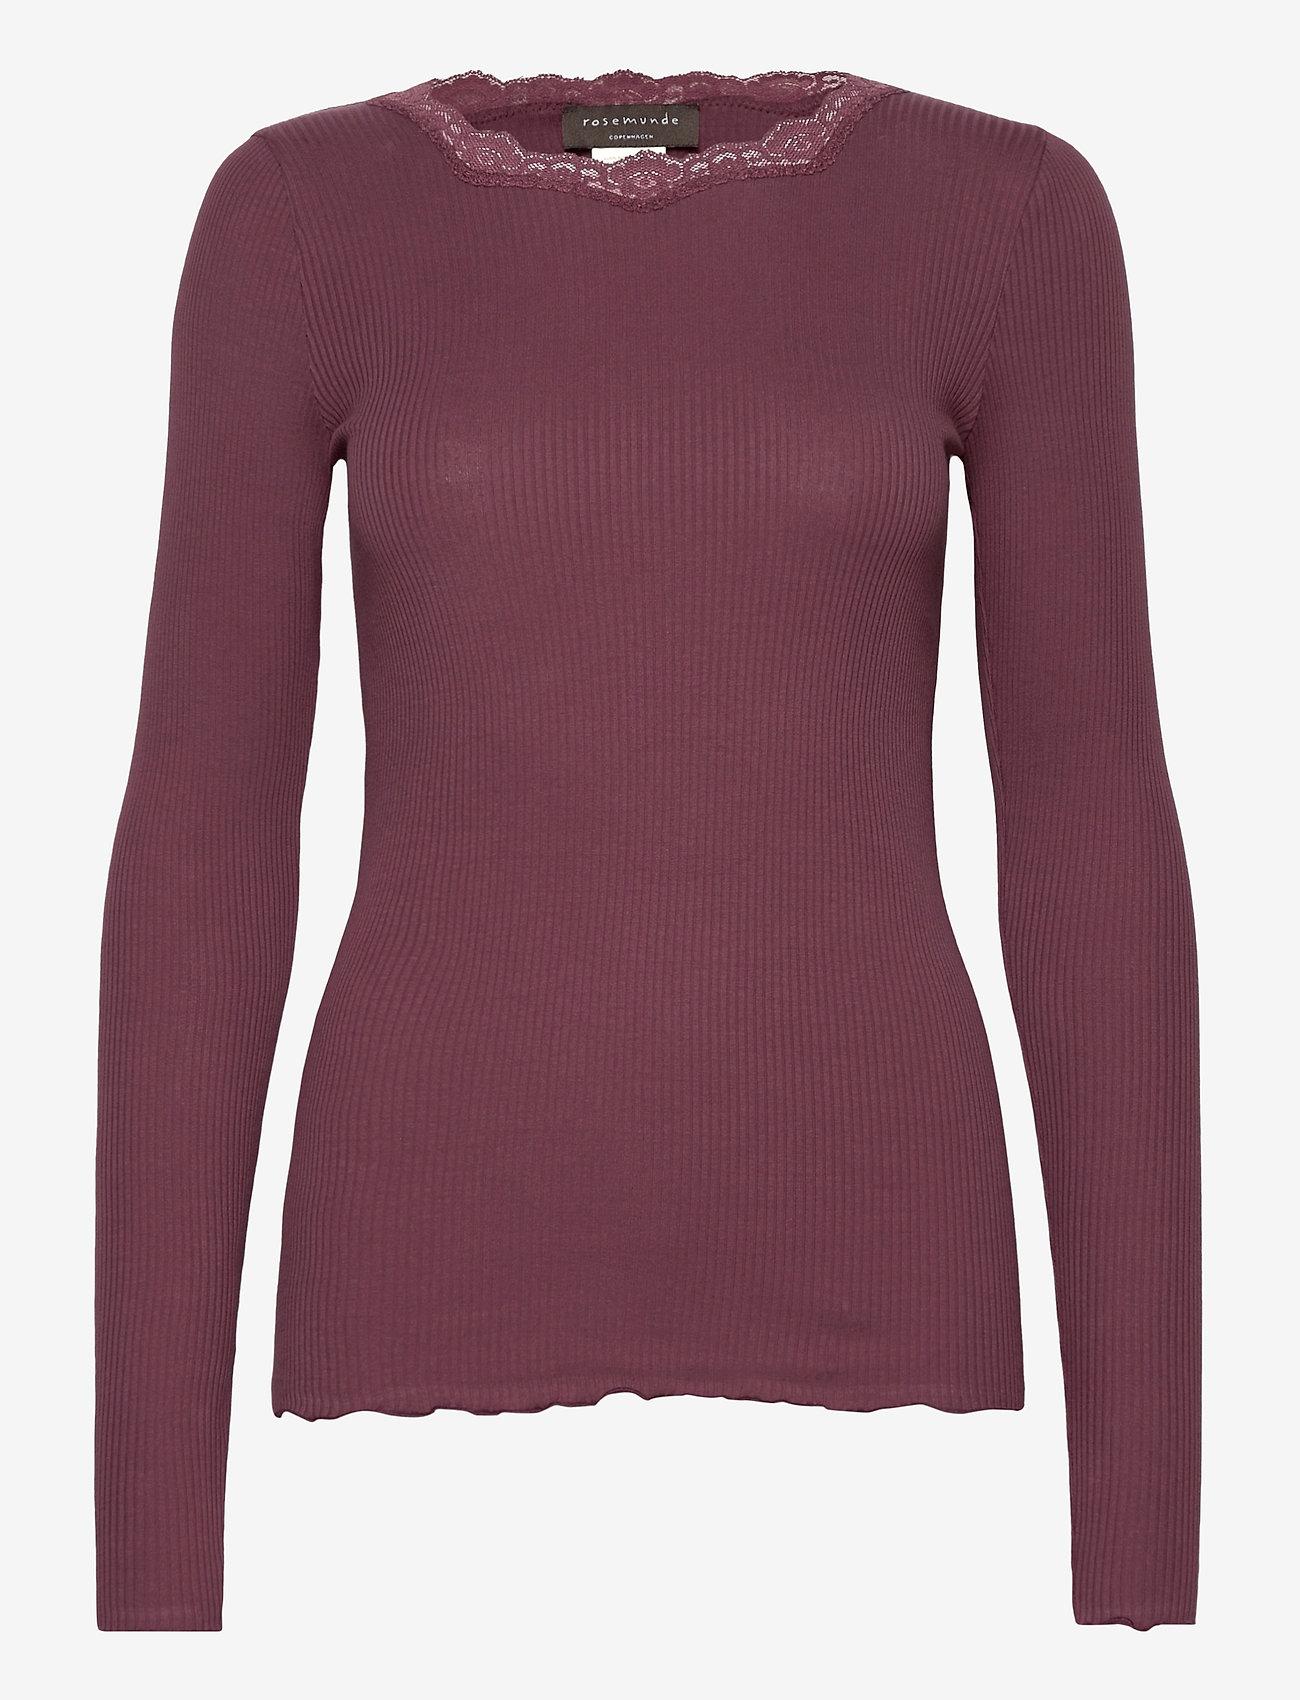 Rosemunde - Organic t-shirt regular w/lace - långärmade toppar - grape - 0